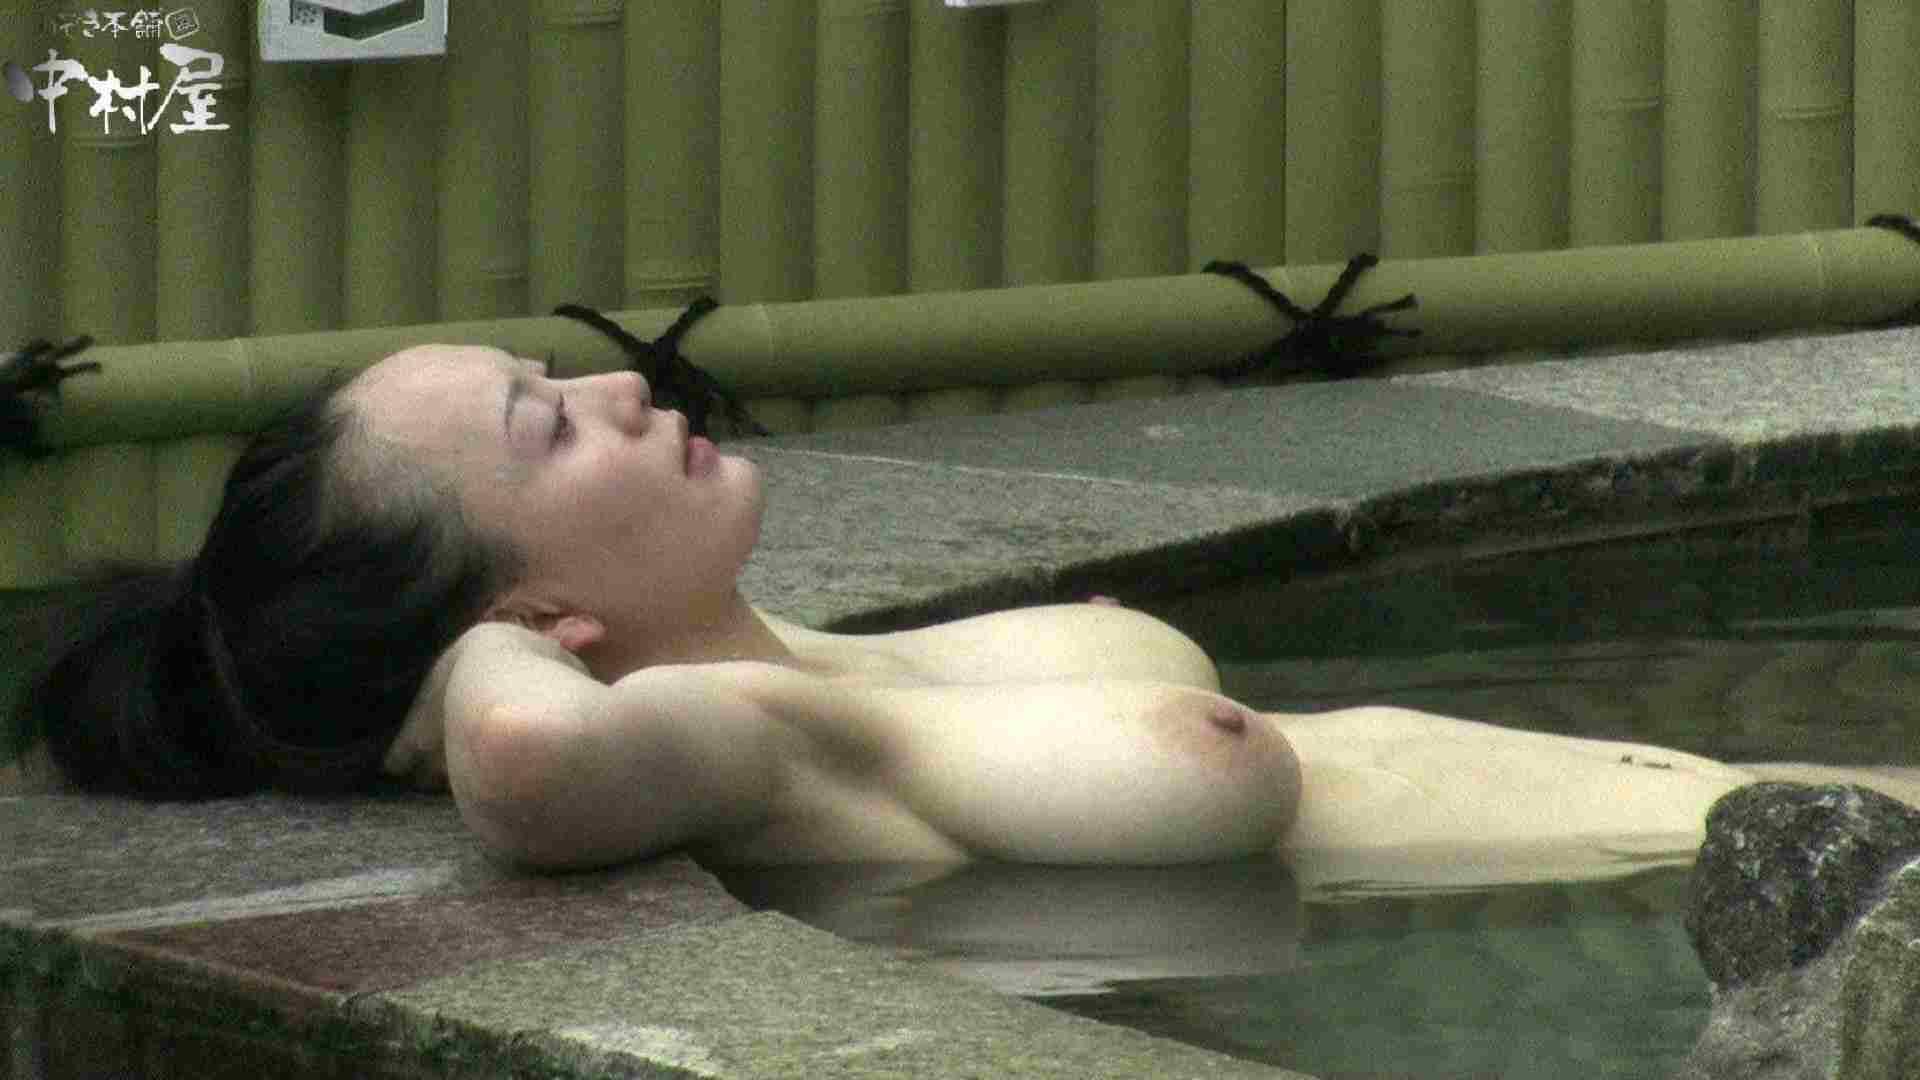 Aquaな露天風呂Vol.900 OLのエロ生活 すけべAV動画紹介 88連発 83